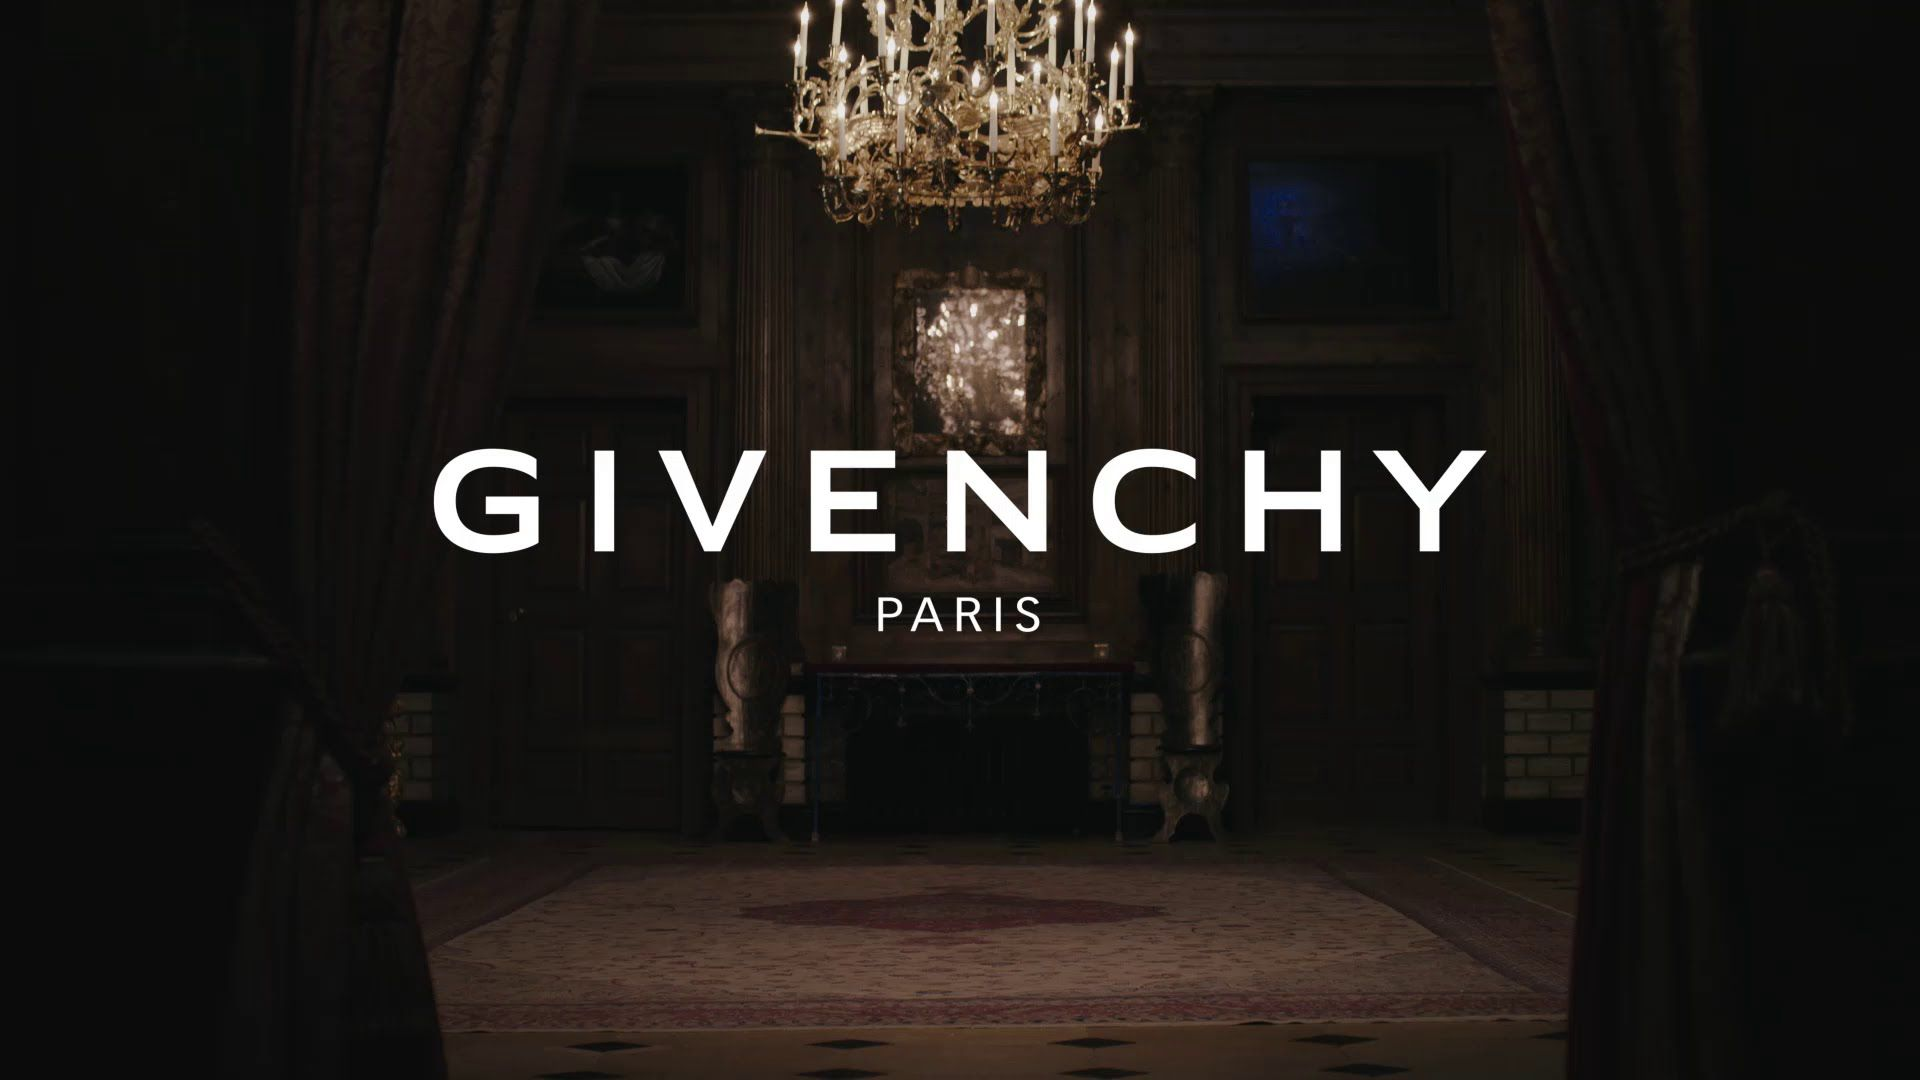 Modna kuća Givenchy opet iznenadila